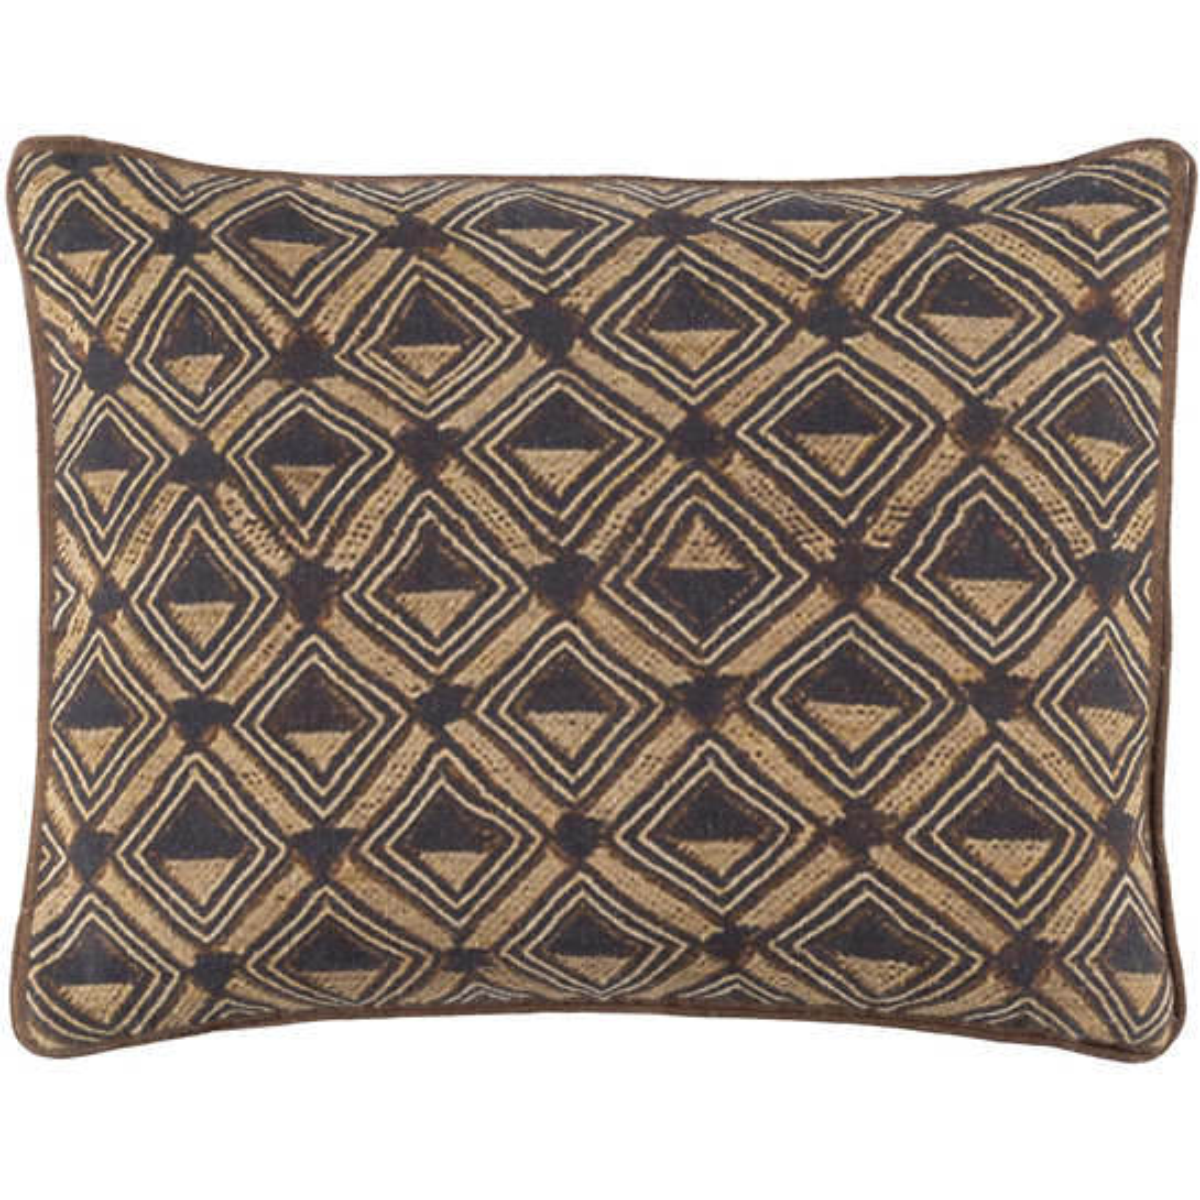 Nairobi Linen Decorative Pillow